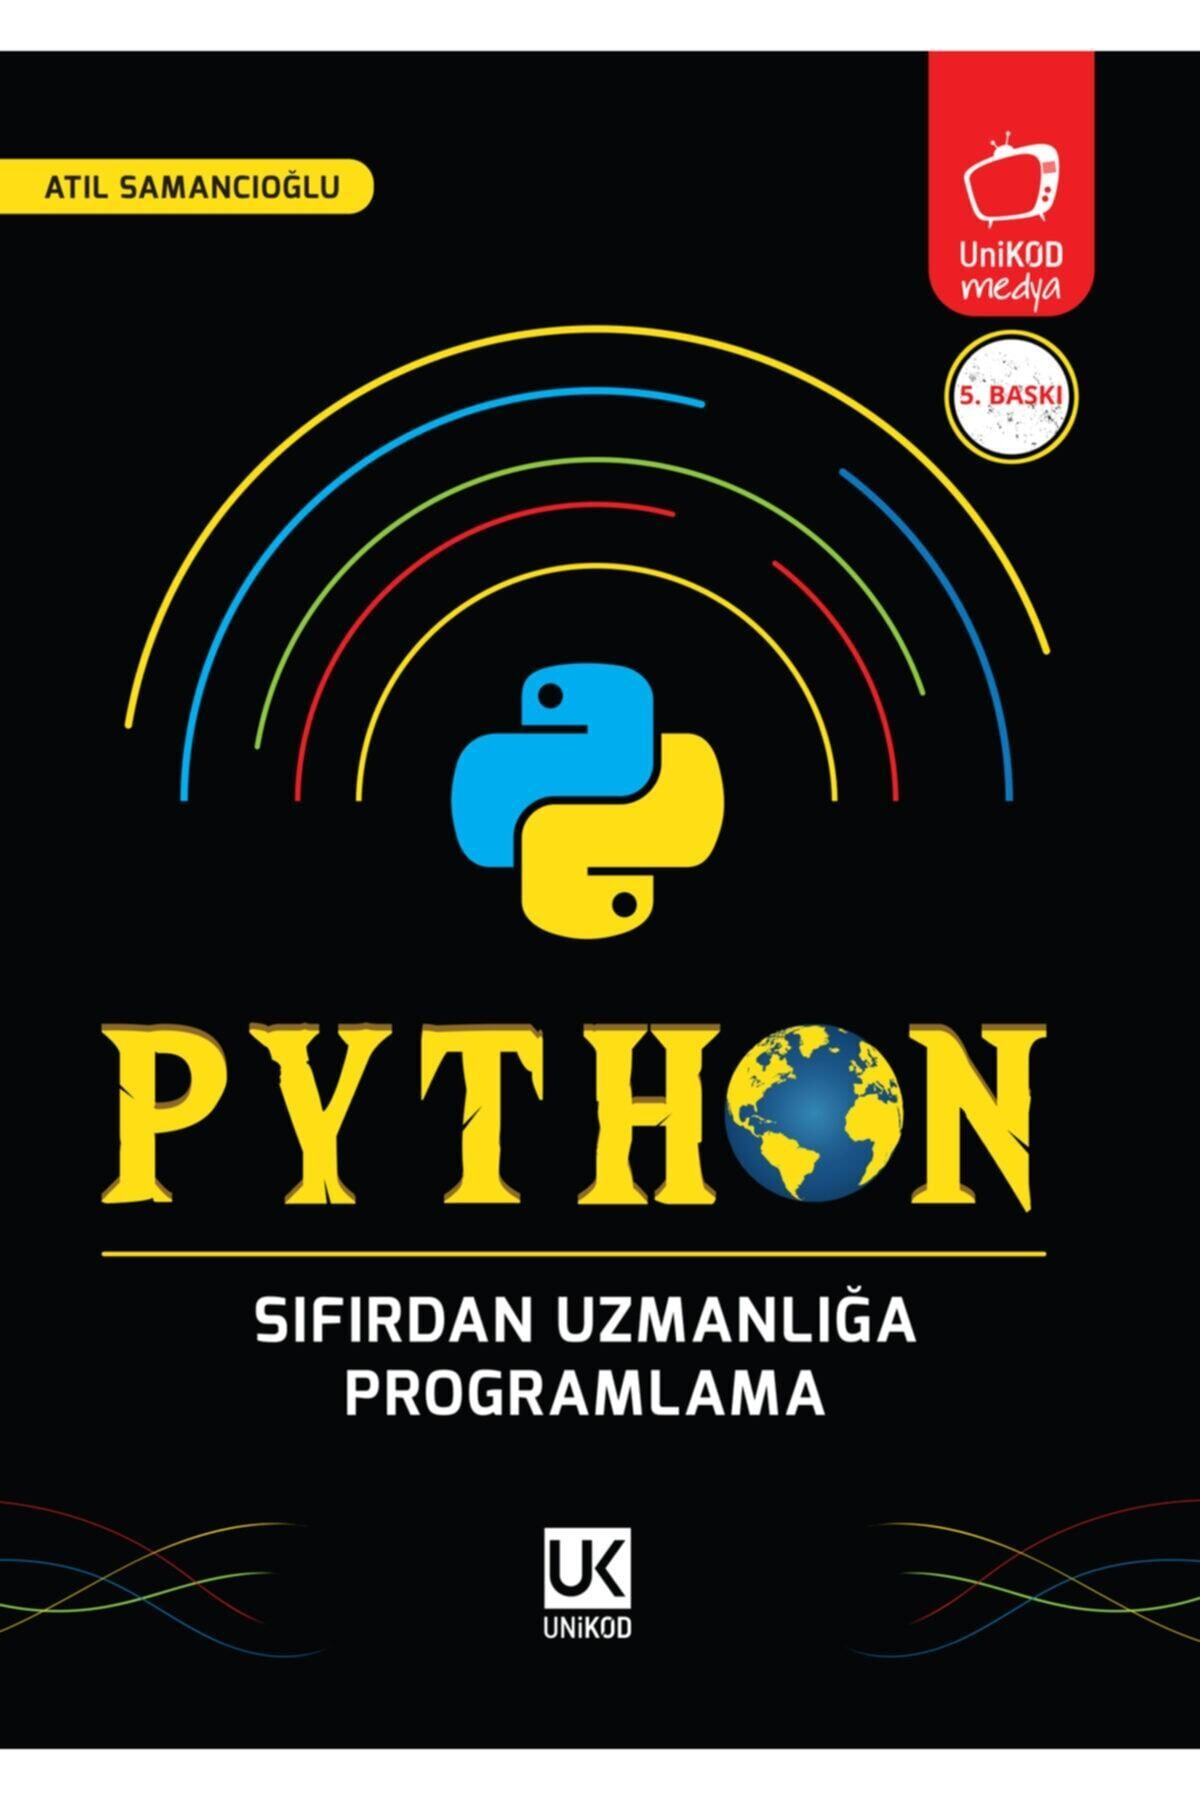 Sıfırdan Uzmanlığa Python Programlama